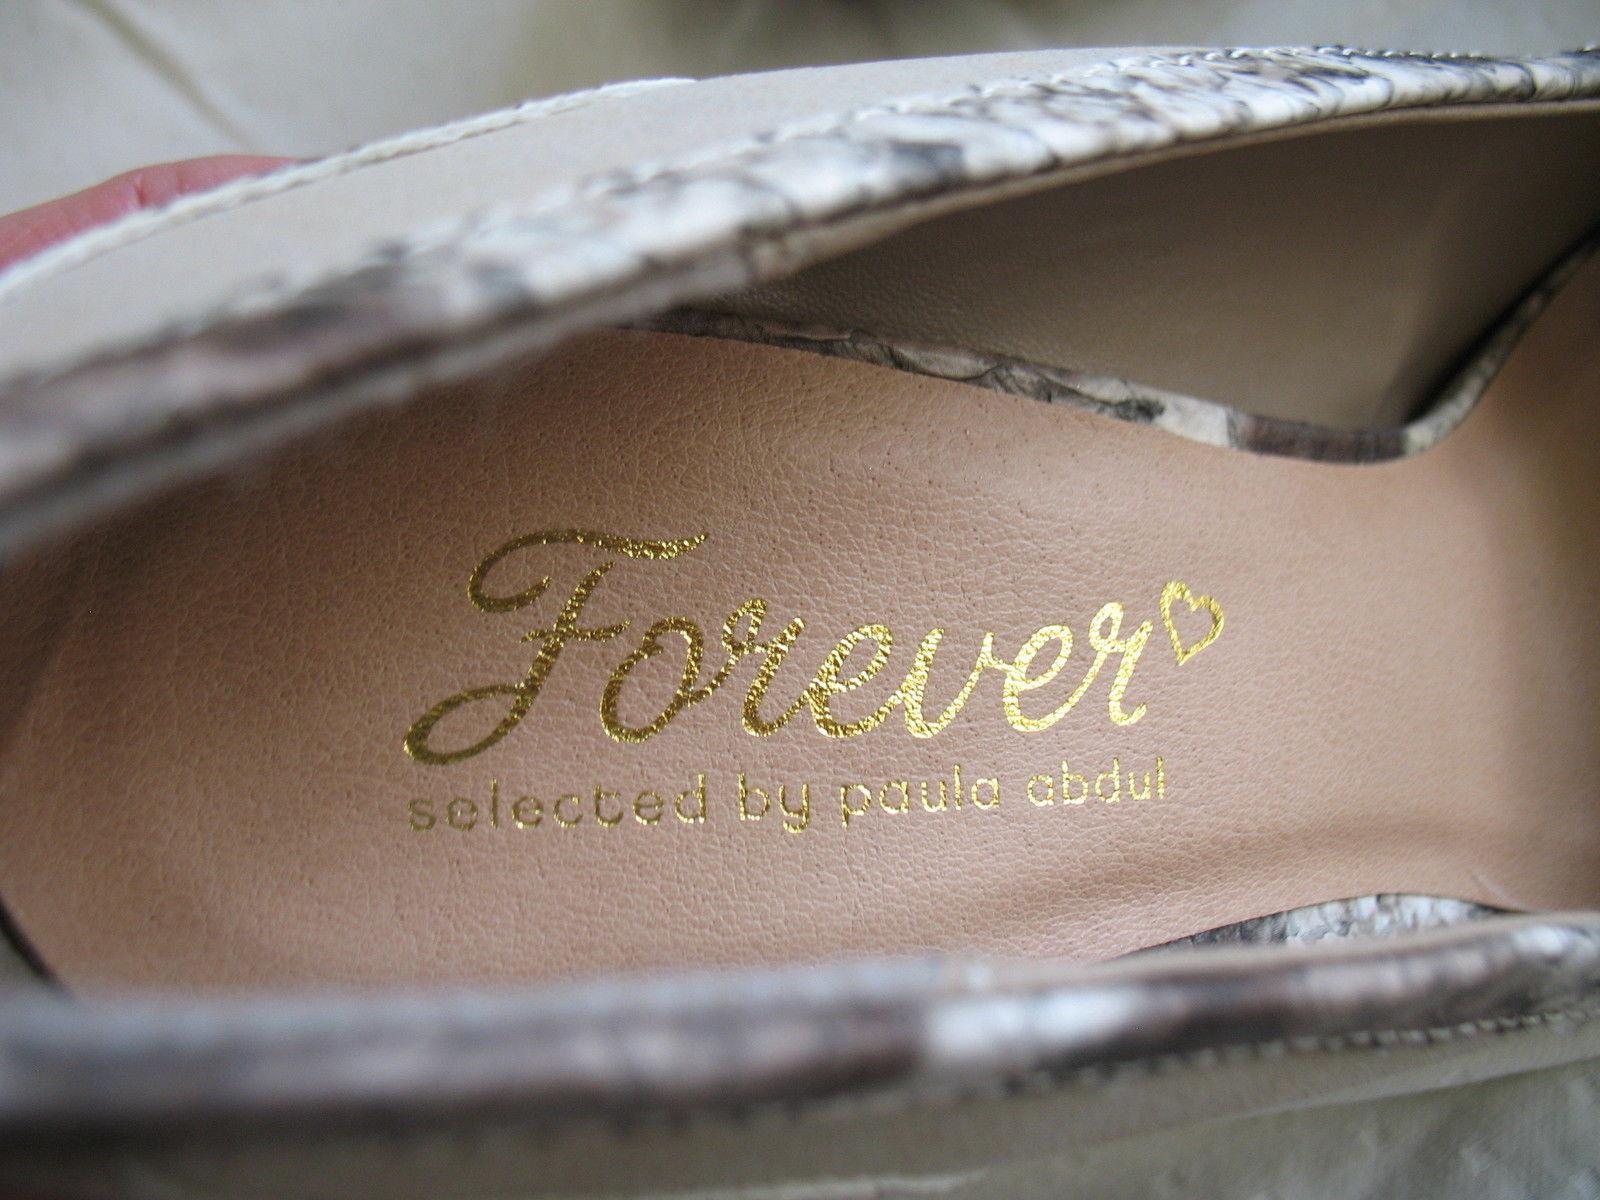 Forever Paula Abdul Size 8 Exotic Print Pump New High Heel Beige Avon Club Style image 7